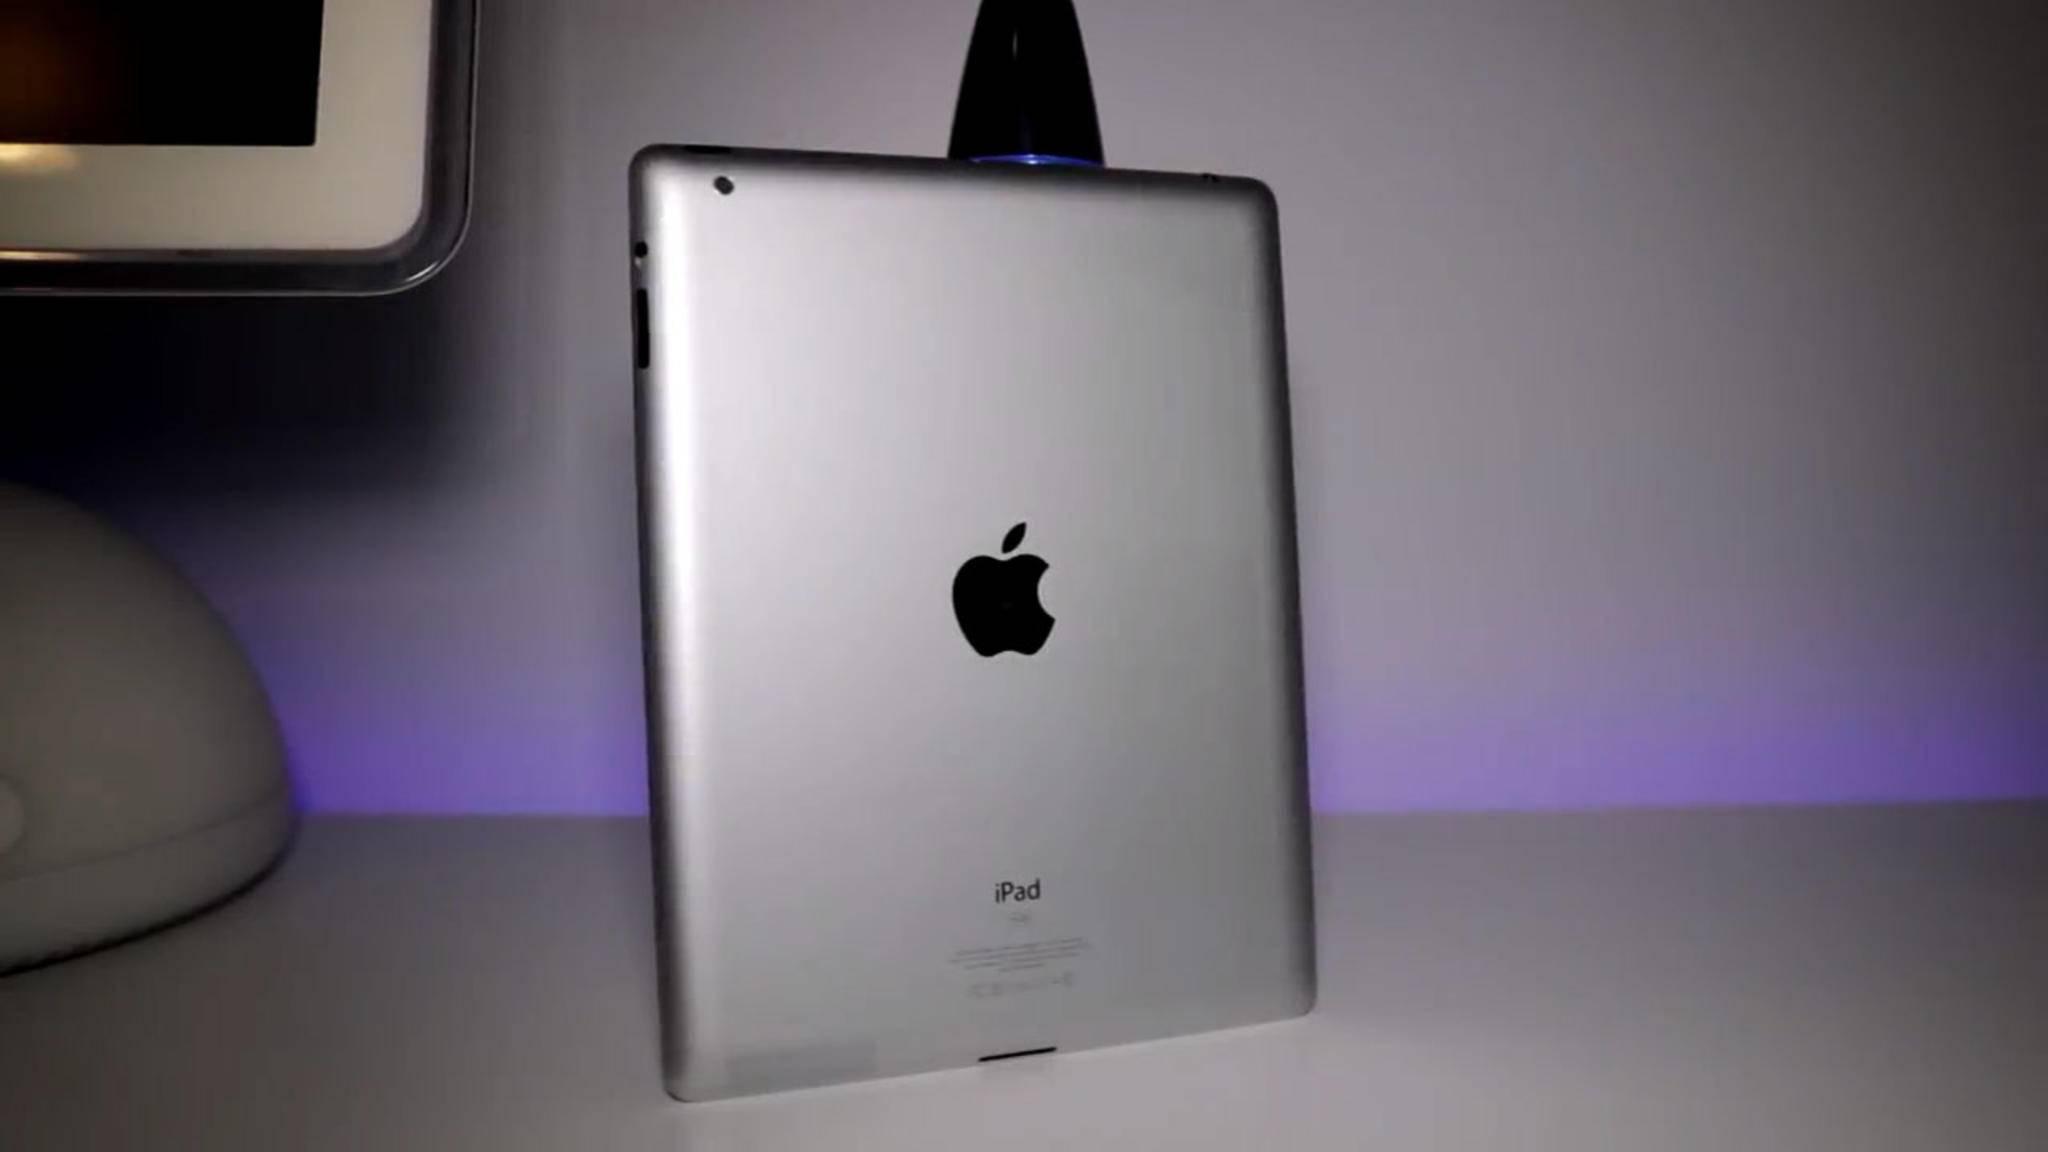 Ab Ende April endgültig auf dem Abstellgleis: das iPad 2 aus dem Jahr 2011.